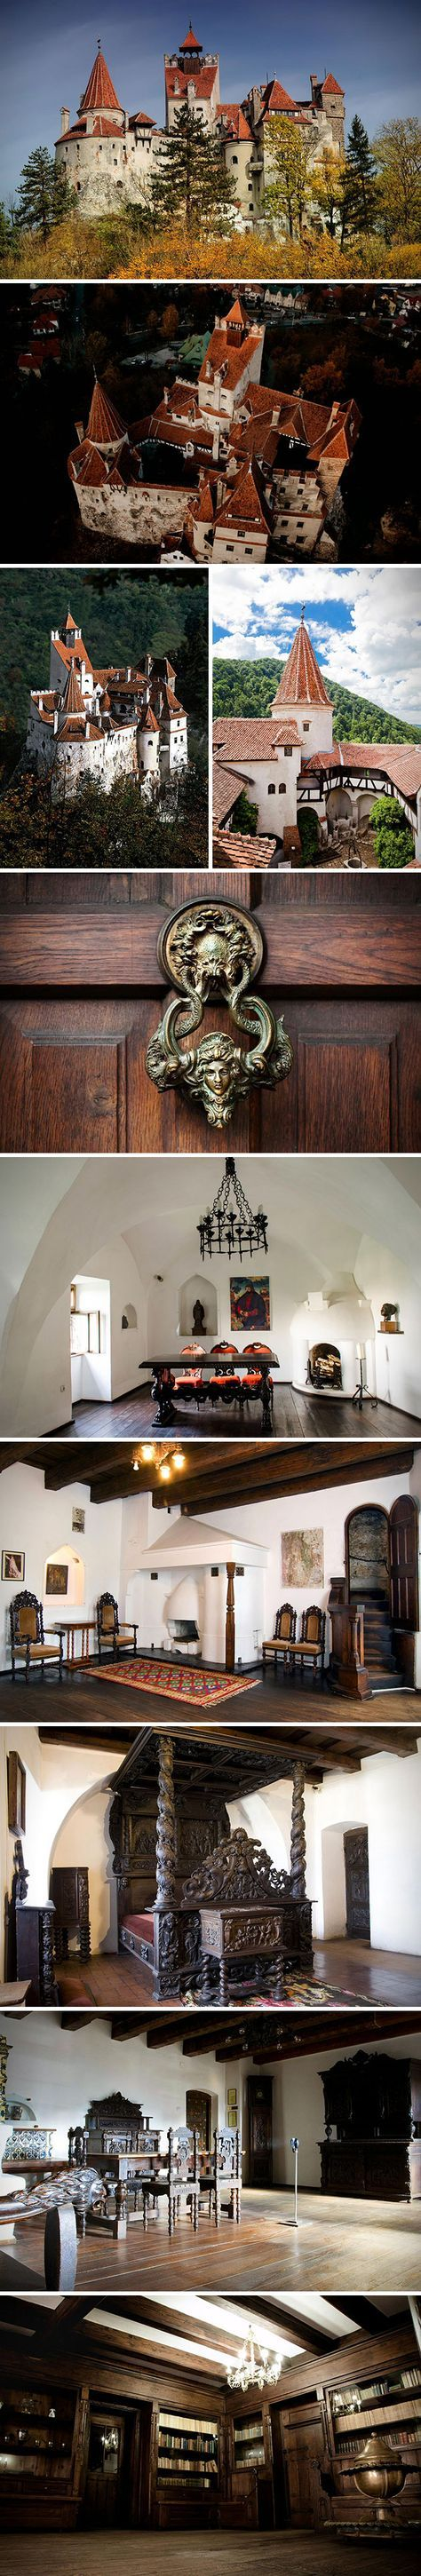 Rare look inside Bran Castle, the real-life Dracula Castle in Transylvania, Romania.